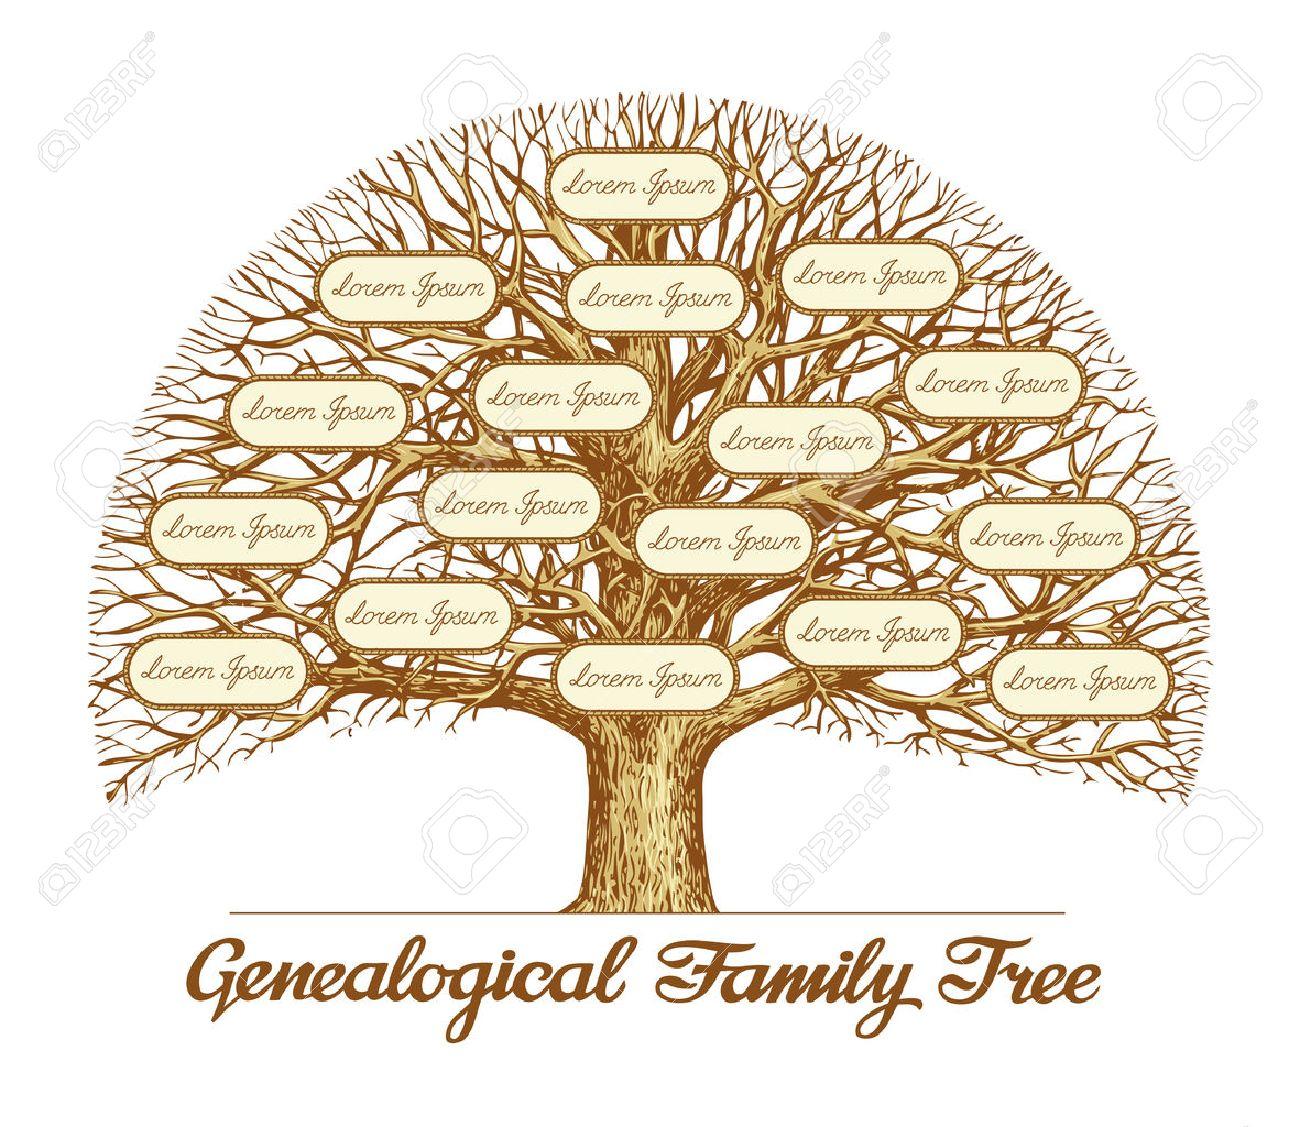 Vintage Genealogical Family Tree. Hand drawn sketch illustration.